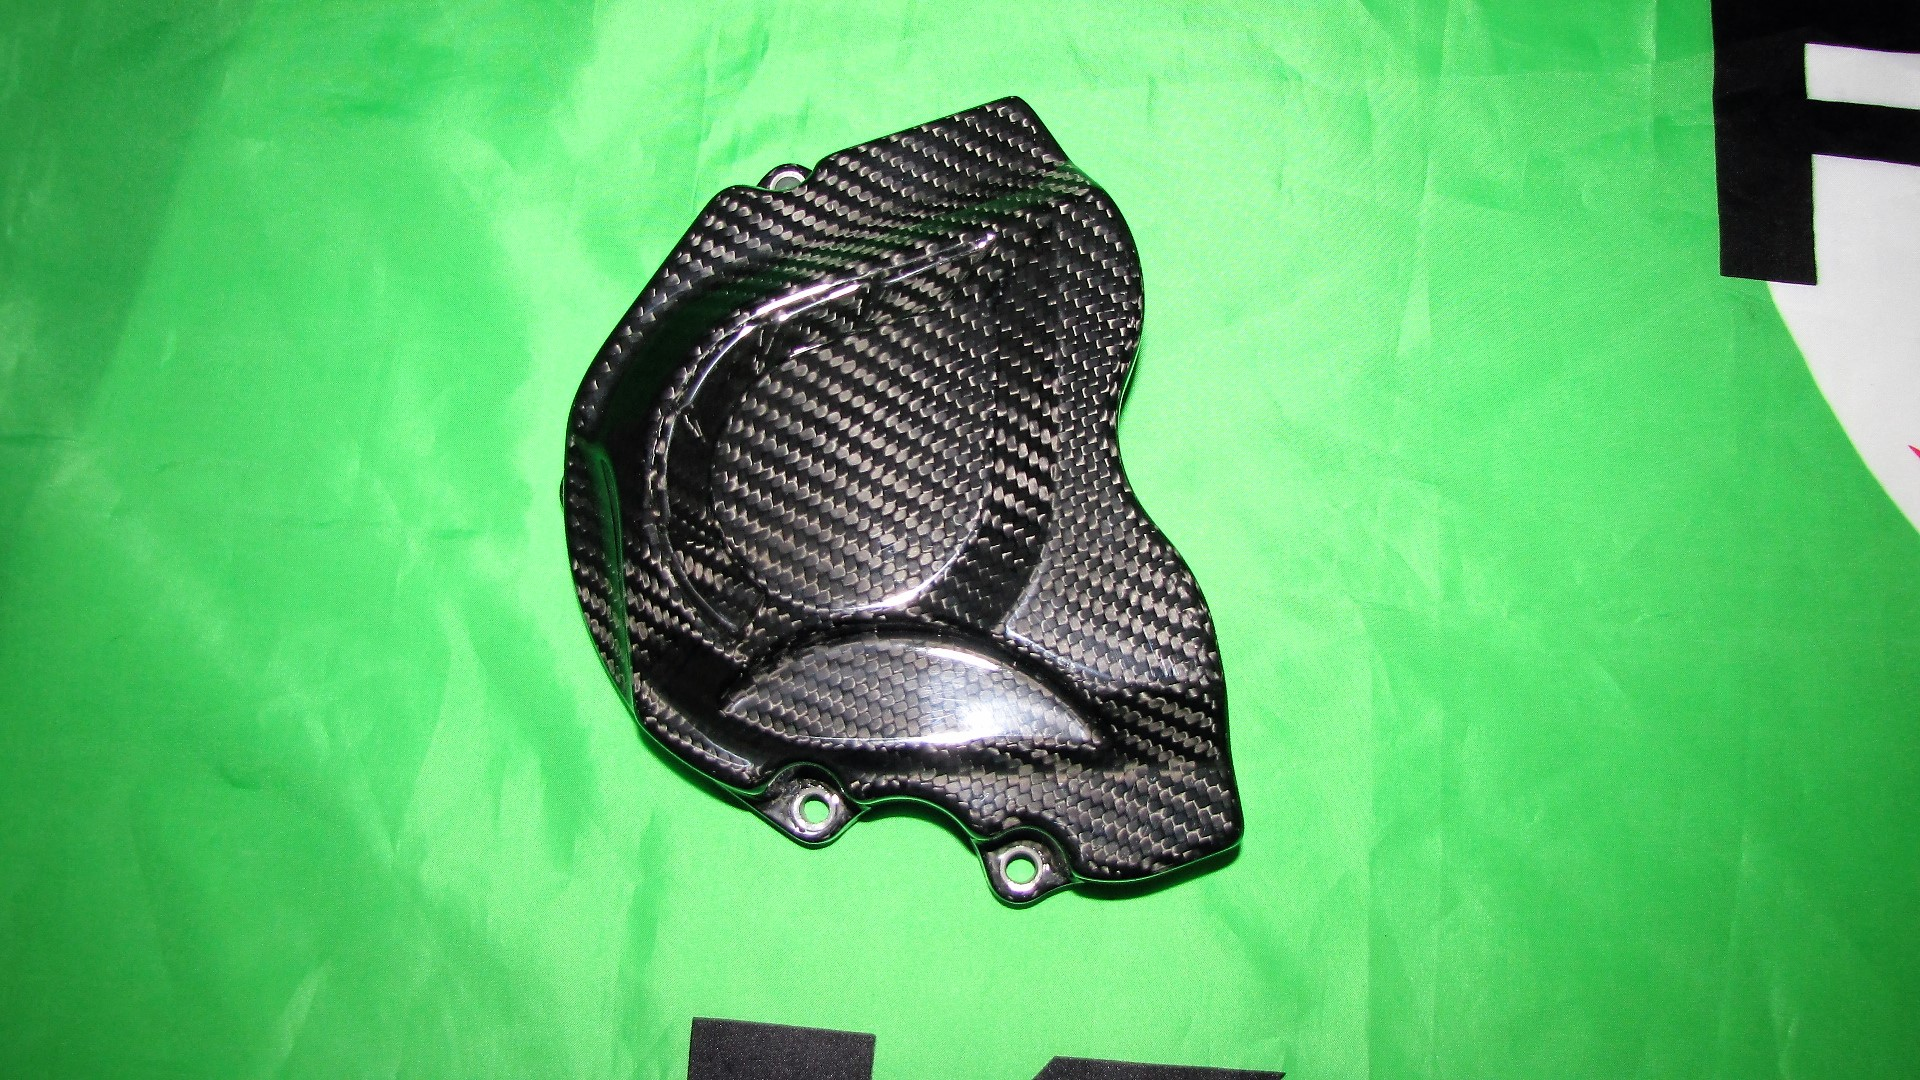 Für Kawasaki ZX10-R Carbon Ritzelabdeckung Ritzel ab 2010 - 2017